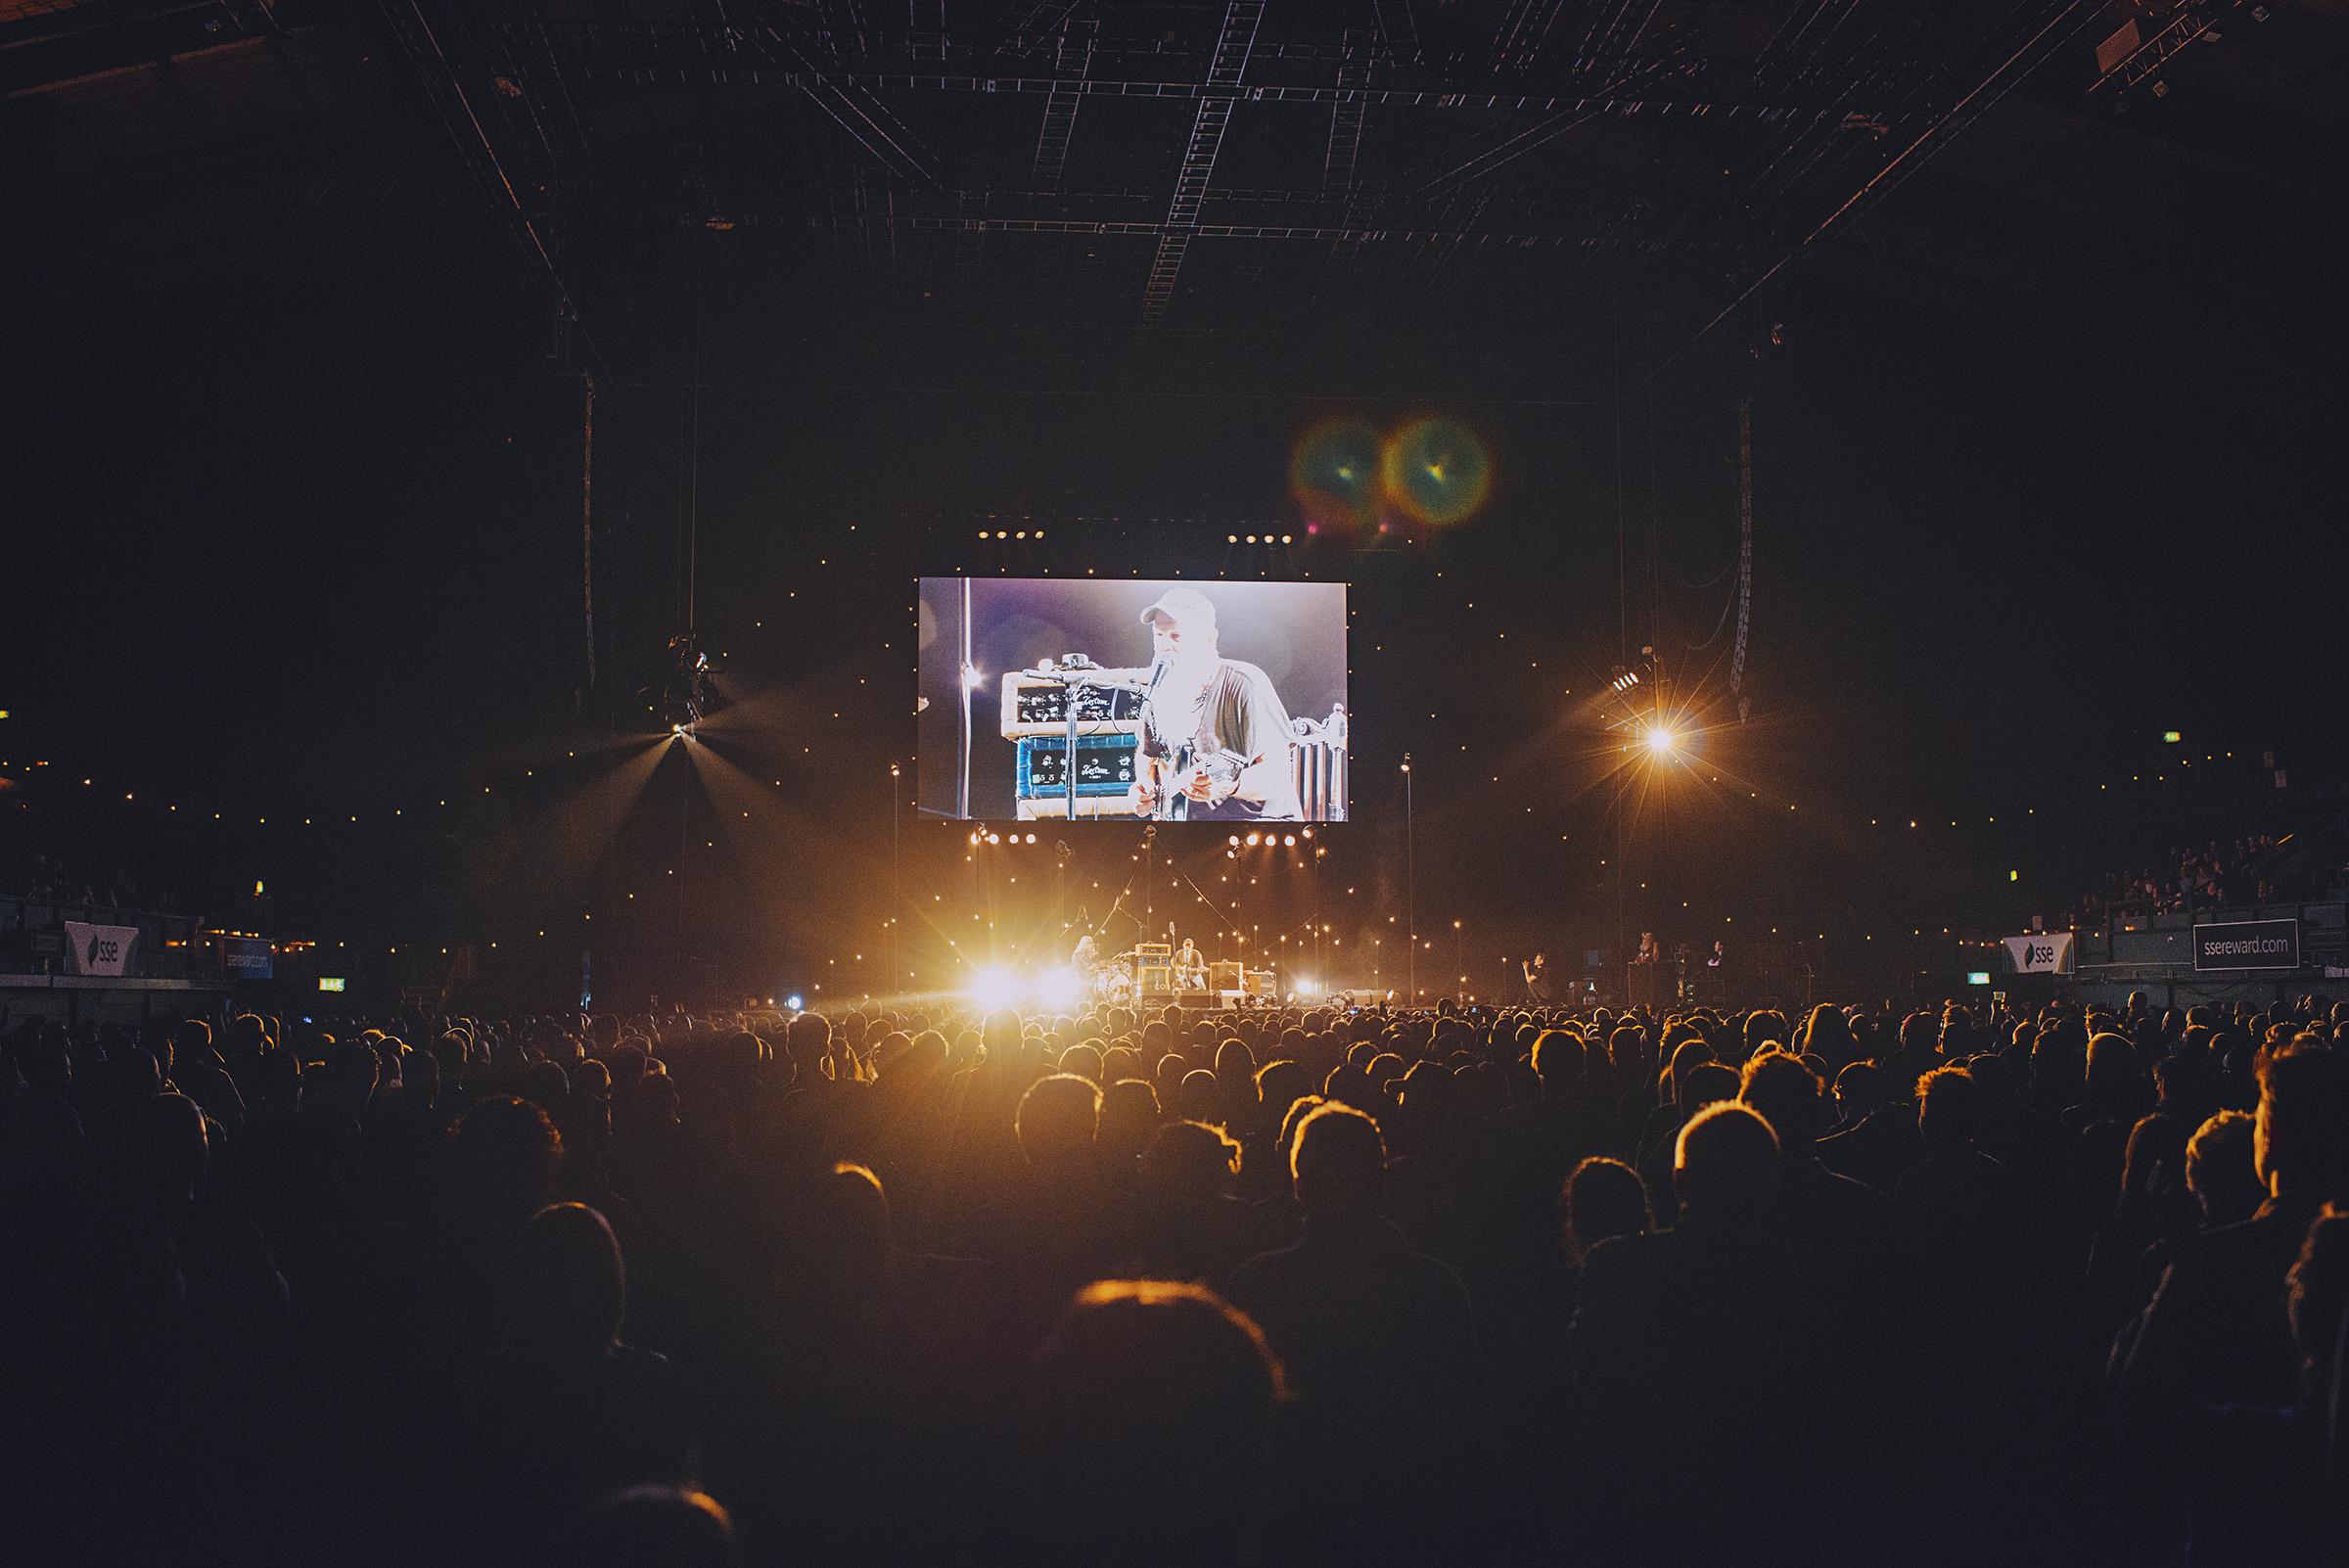 Seasick Steve, SSE Wembley Arena 2016